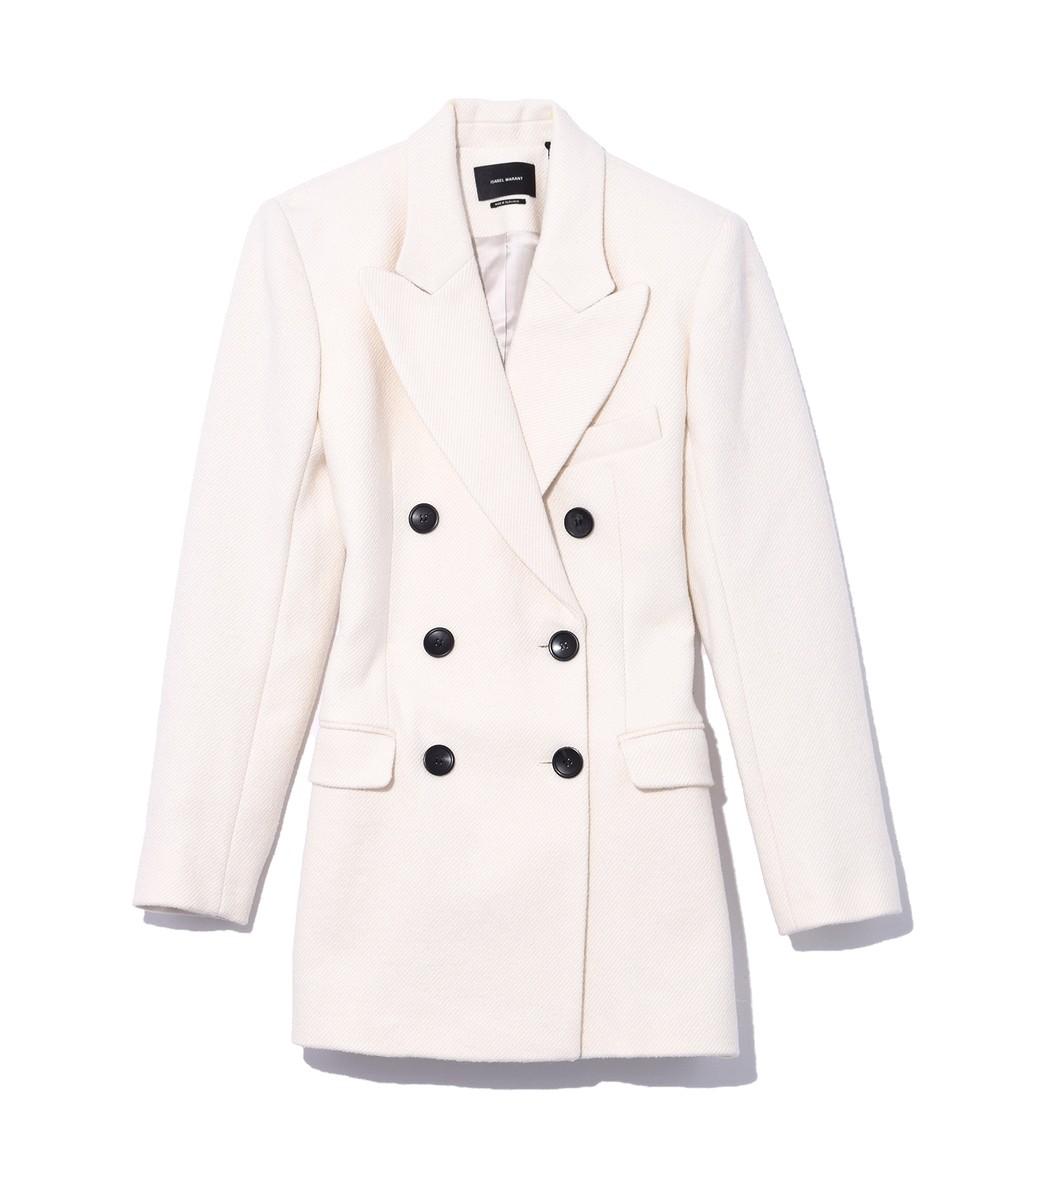 Kyne Jacket in Ecru